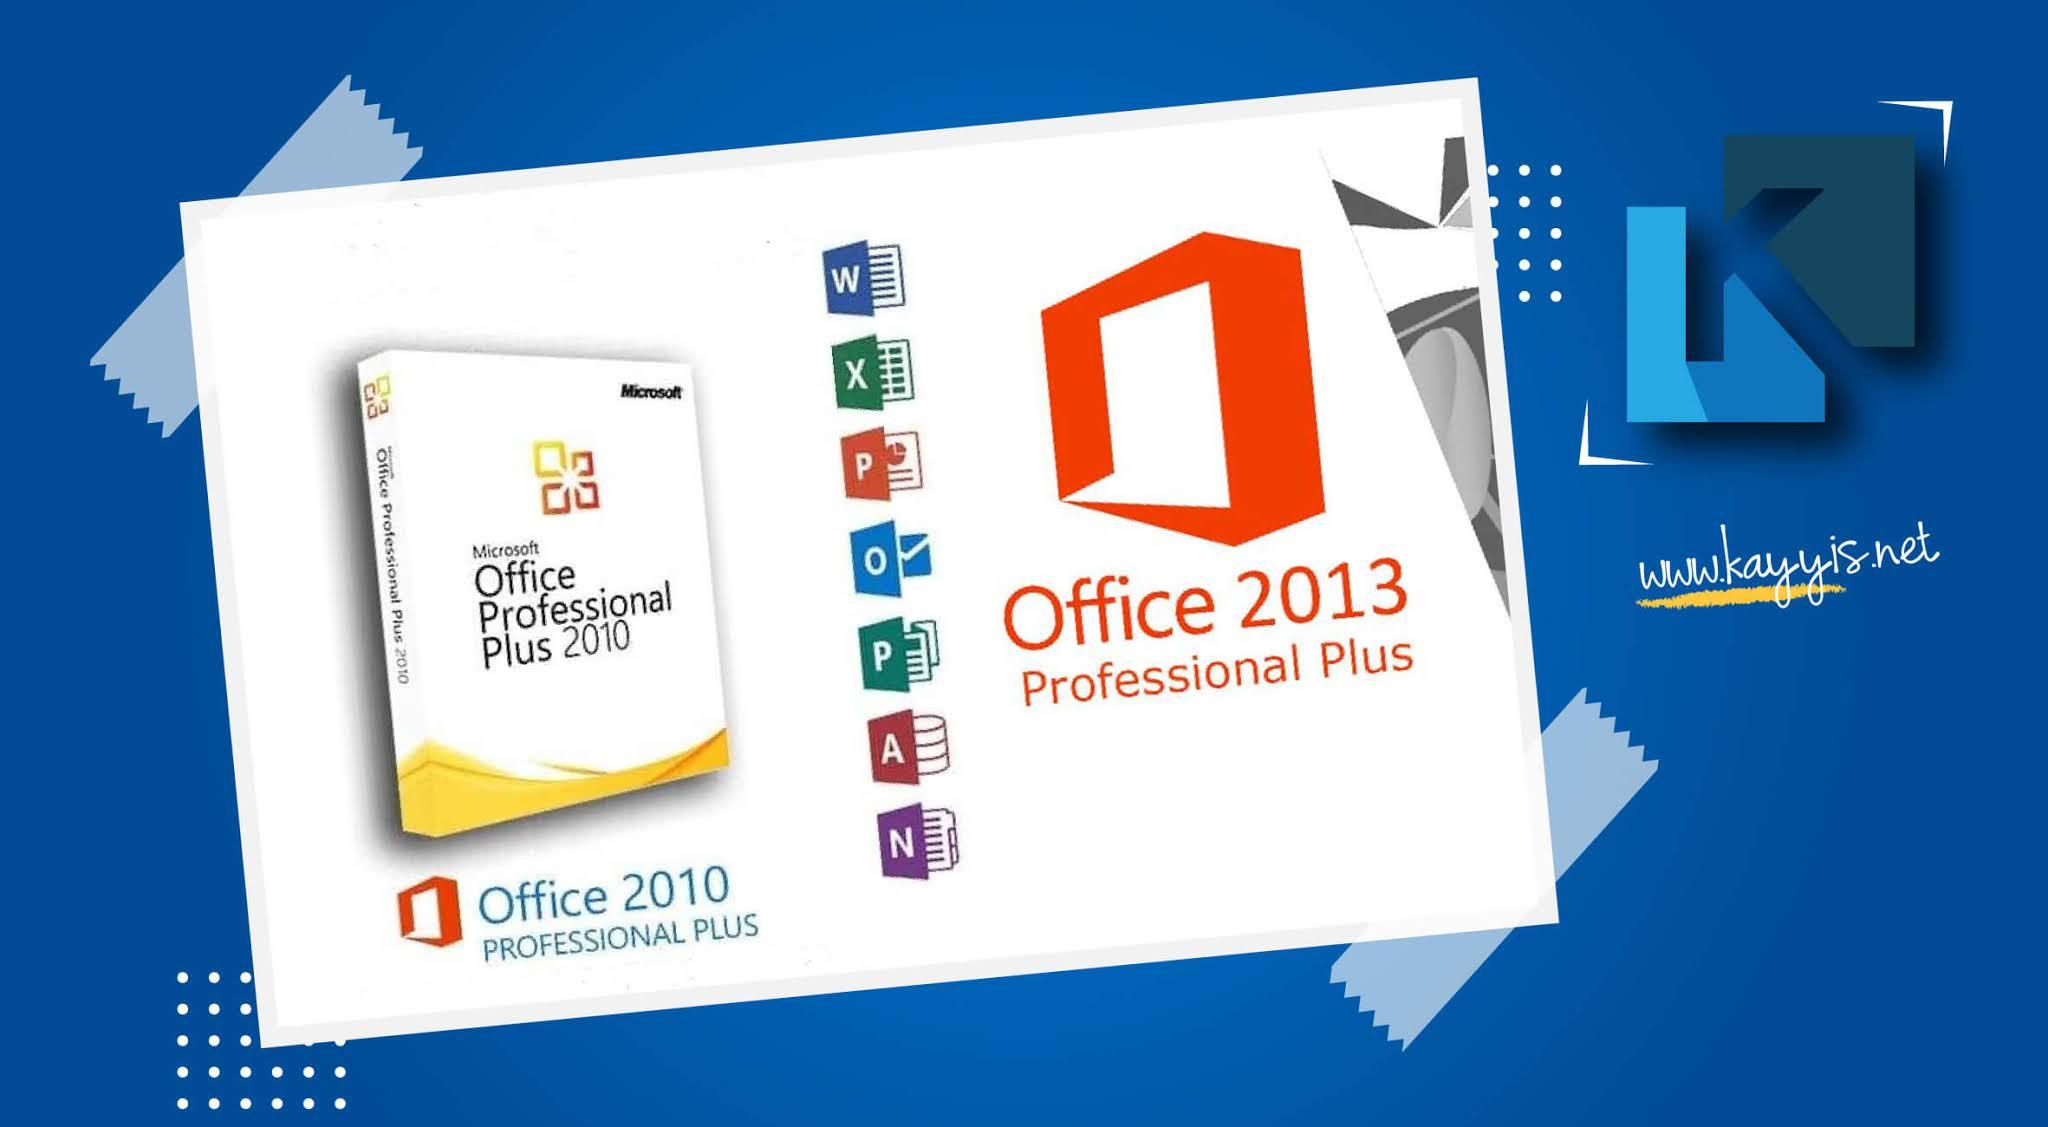 aktivasi office 2010, aktivasi office 2013